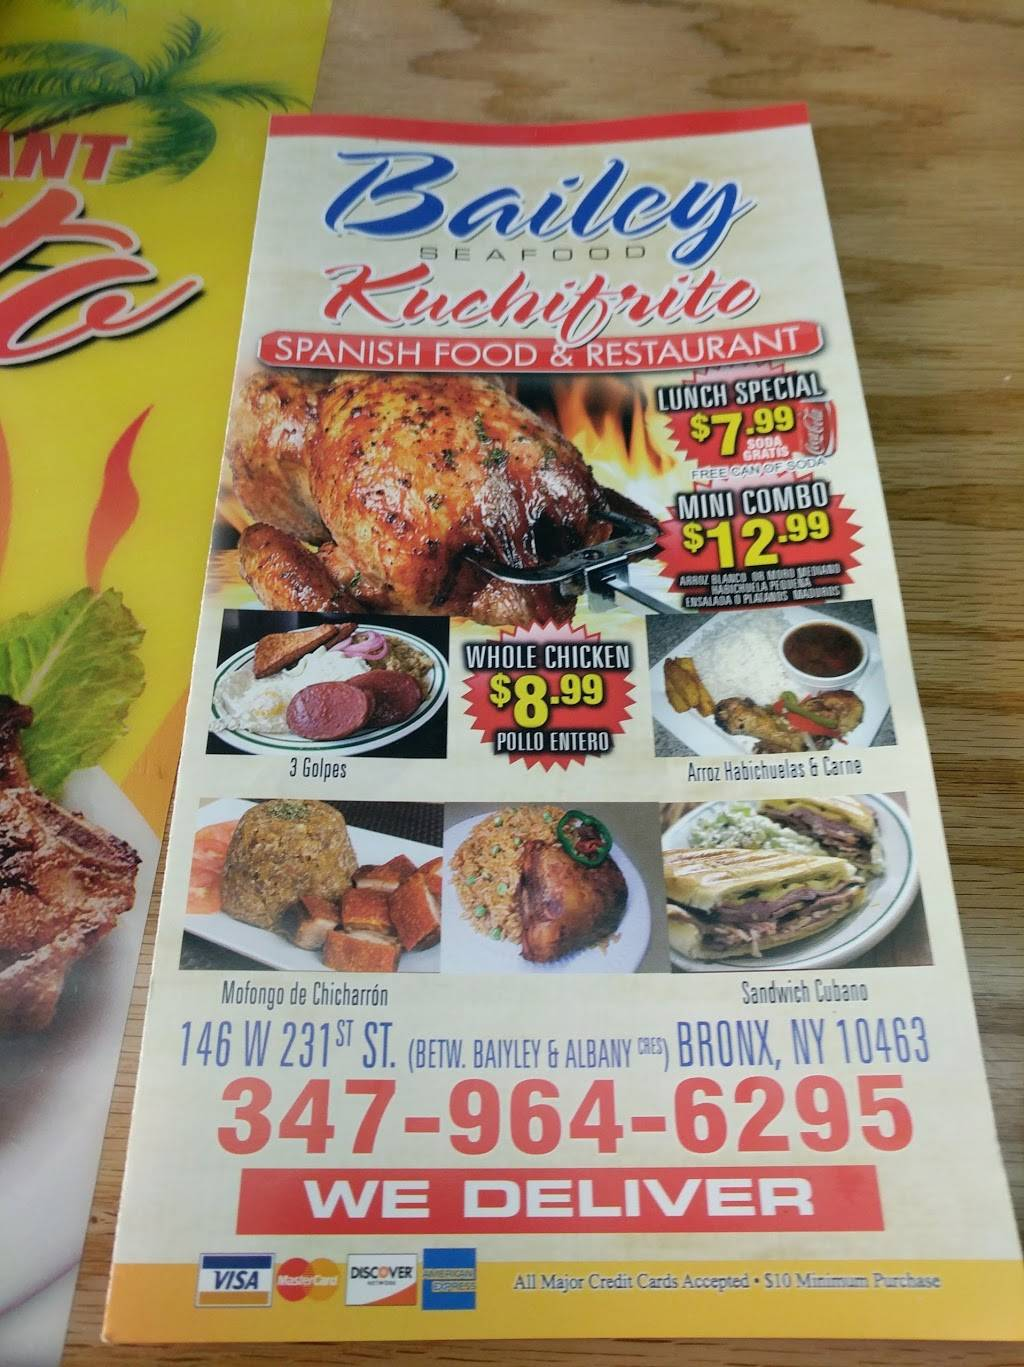 Bailey Sea Food   restaurant   146 W 231st St, Bronx, NY 10463, USA   3479646296 OR +1 347-964-6296